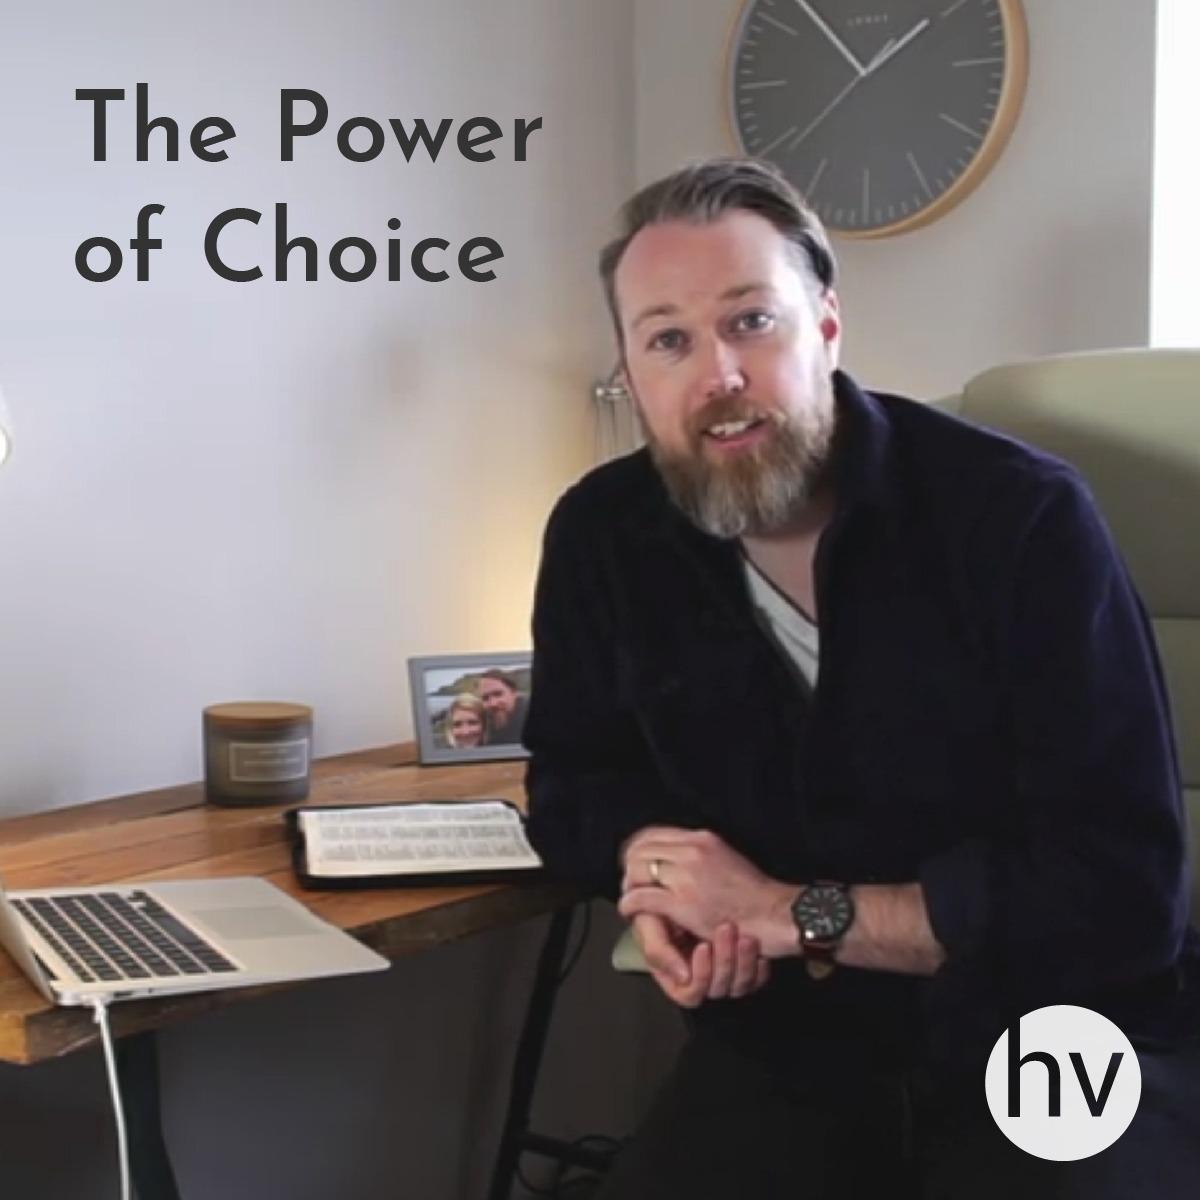 The Power of Choice // John Clarke